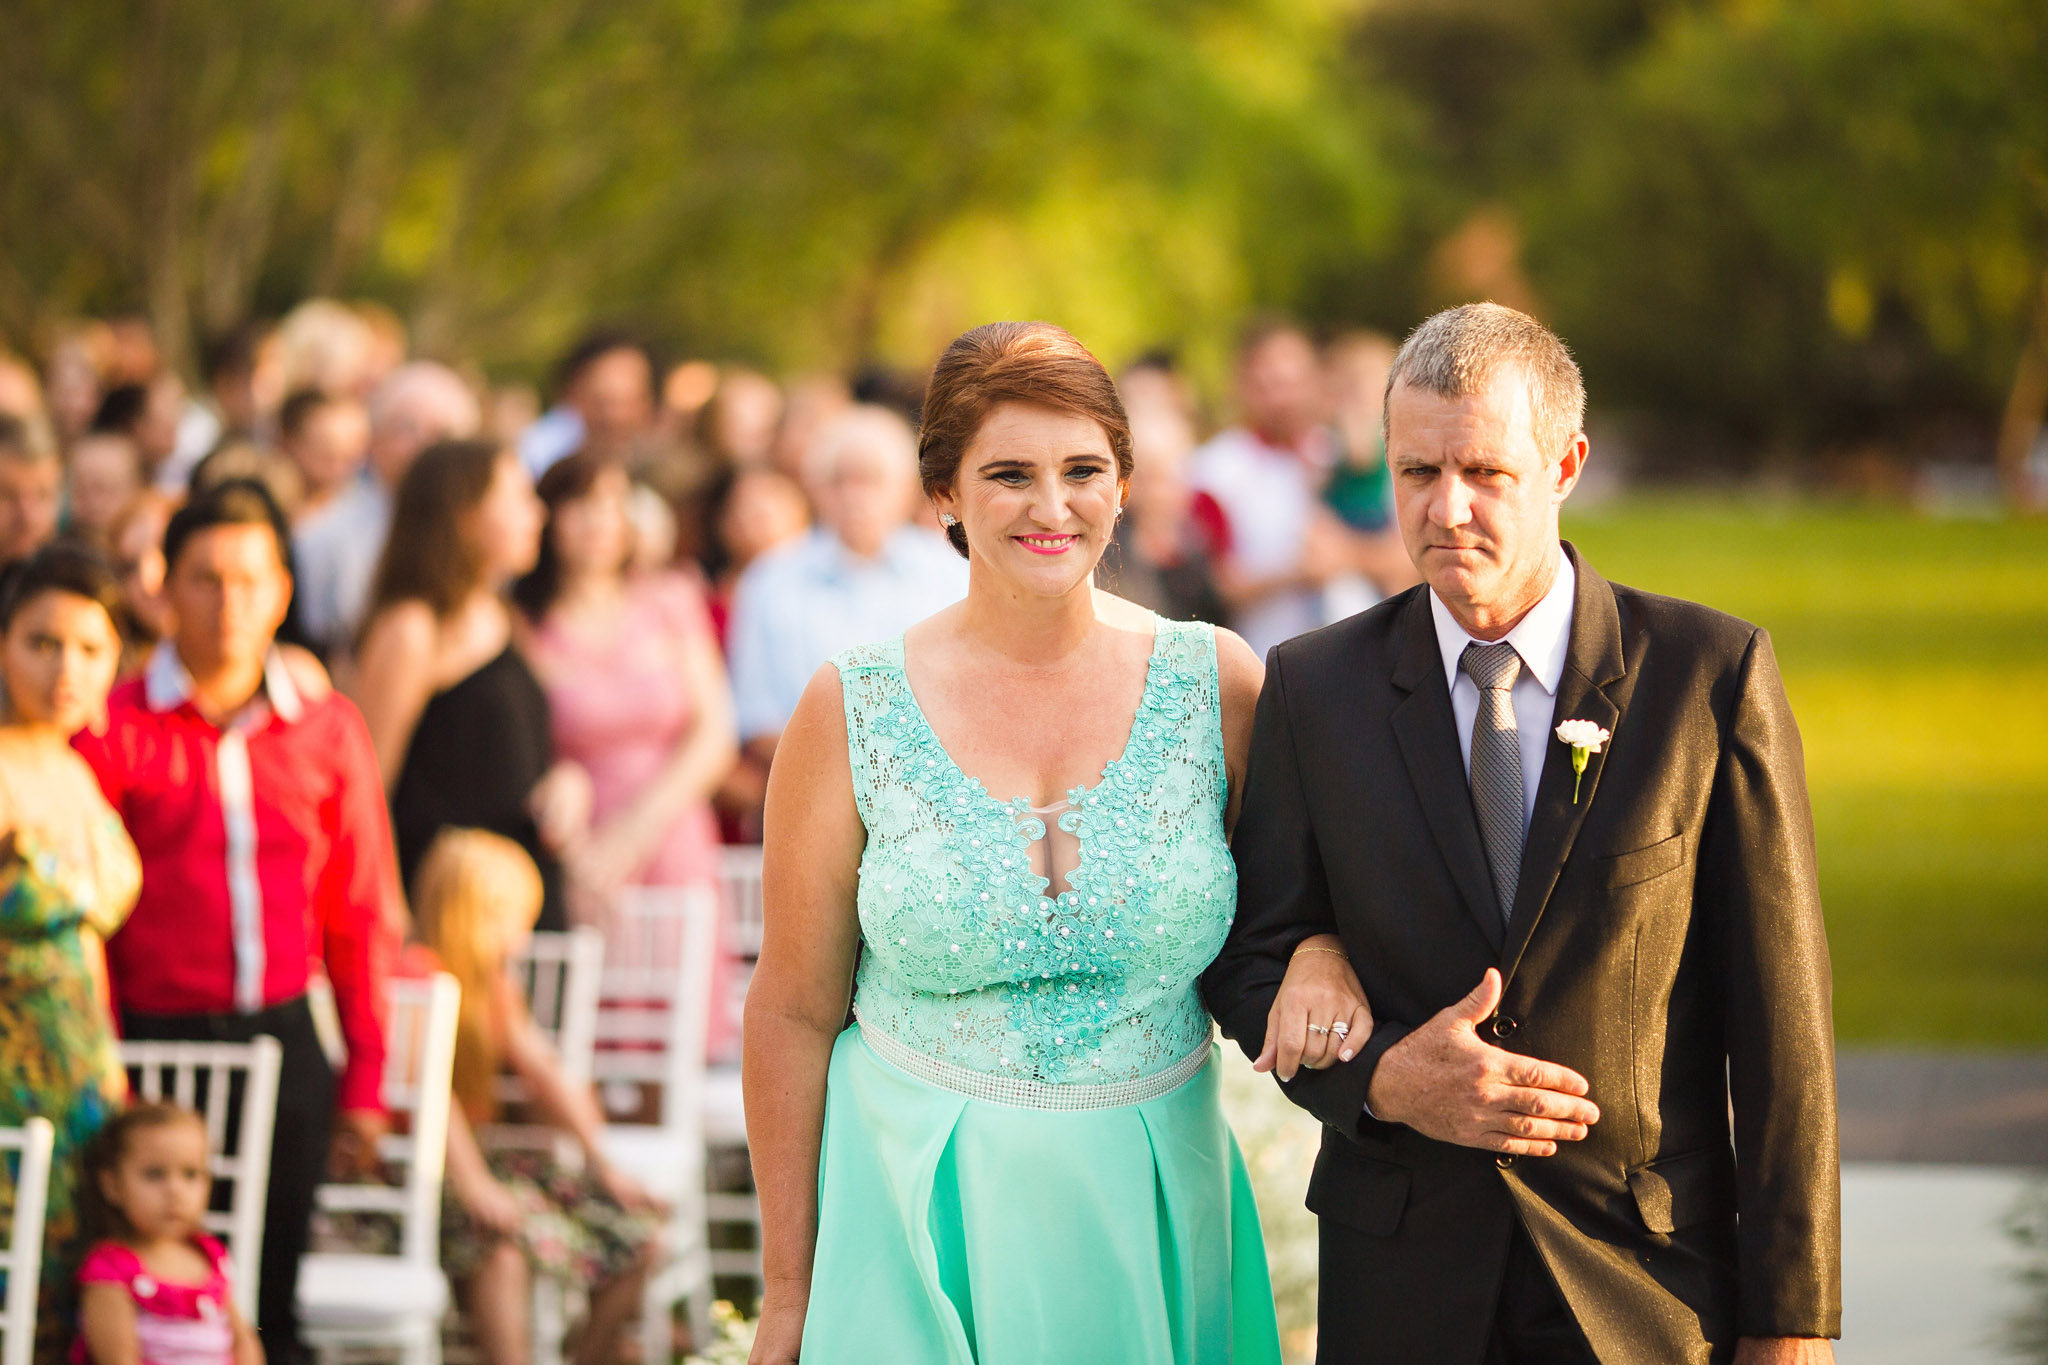 Wedding_Travellers_Destination_Wedding_Photography-52.jpg